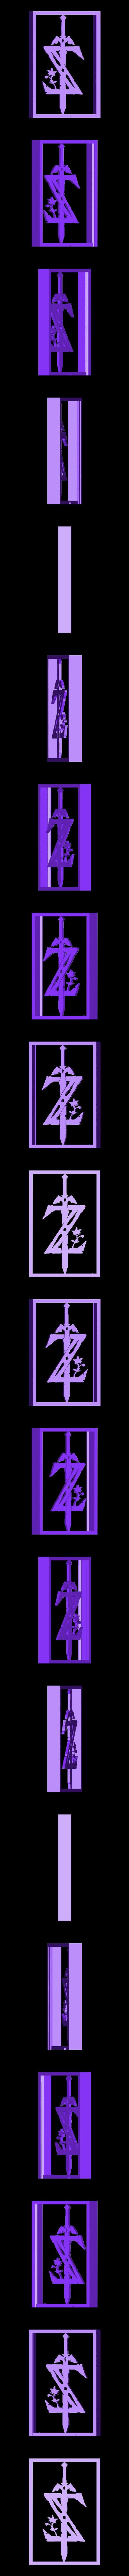 Zelda sil1.stl Télécharger fichier STL gratuit Ornements de silhouette Zelda • Plan imprimable en 3D, CheesmondN